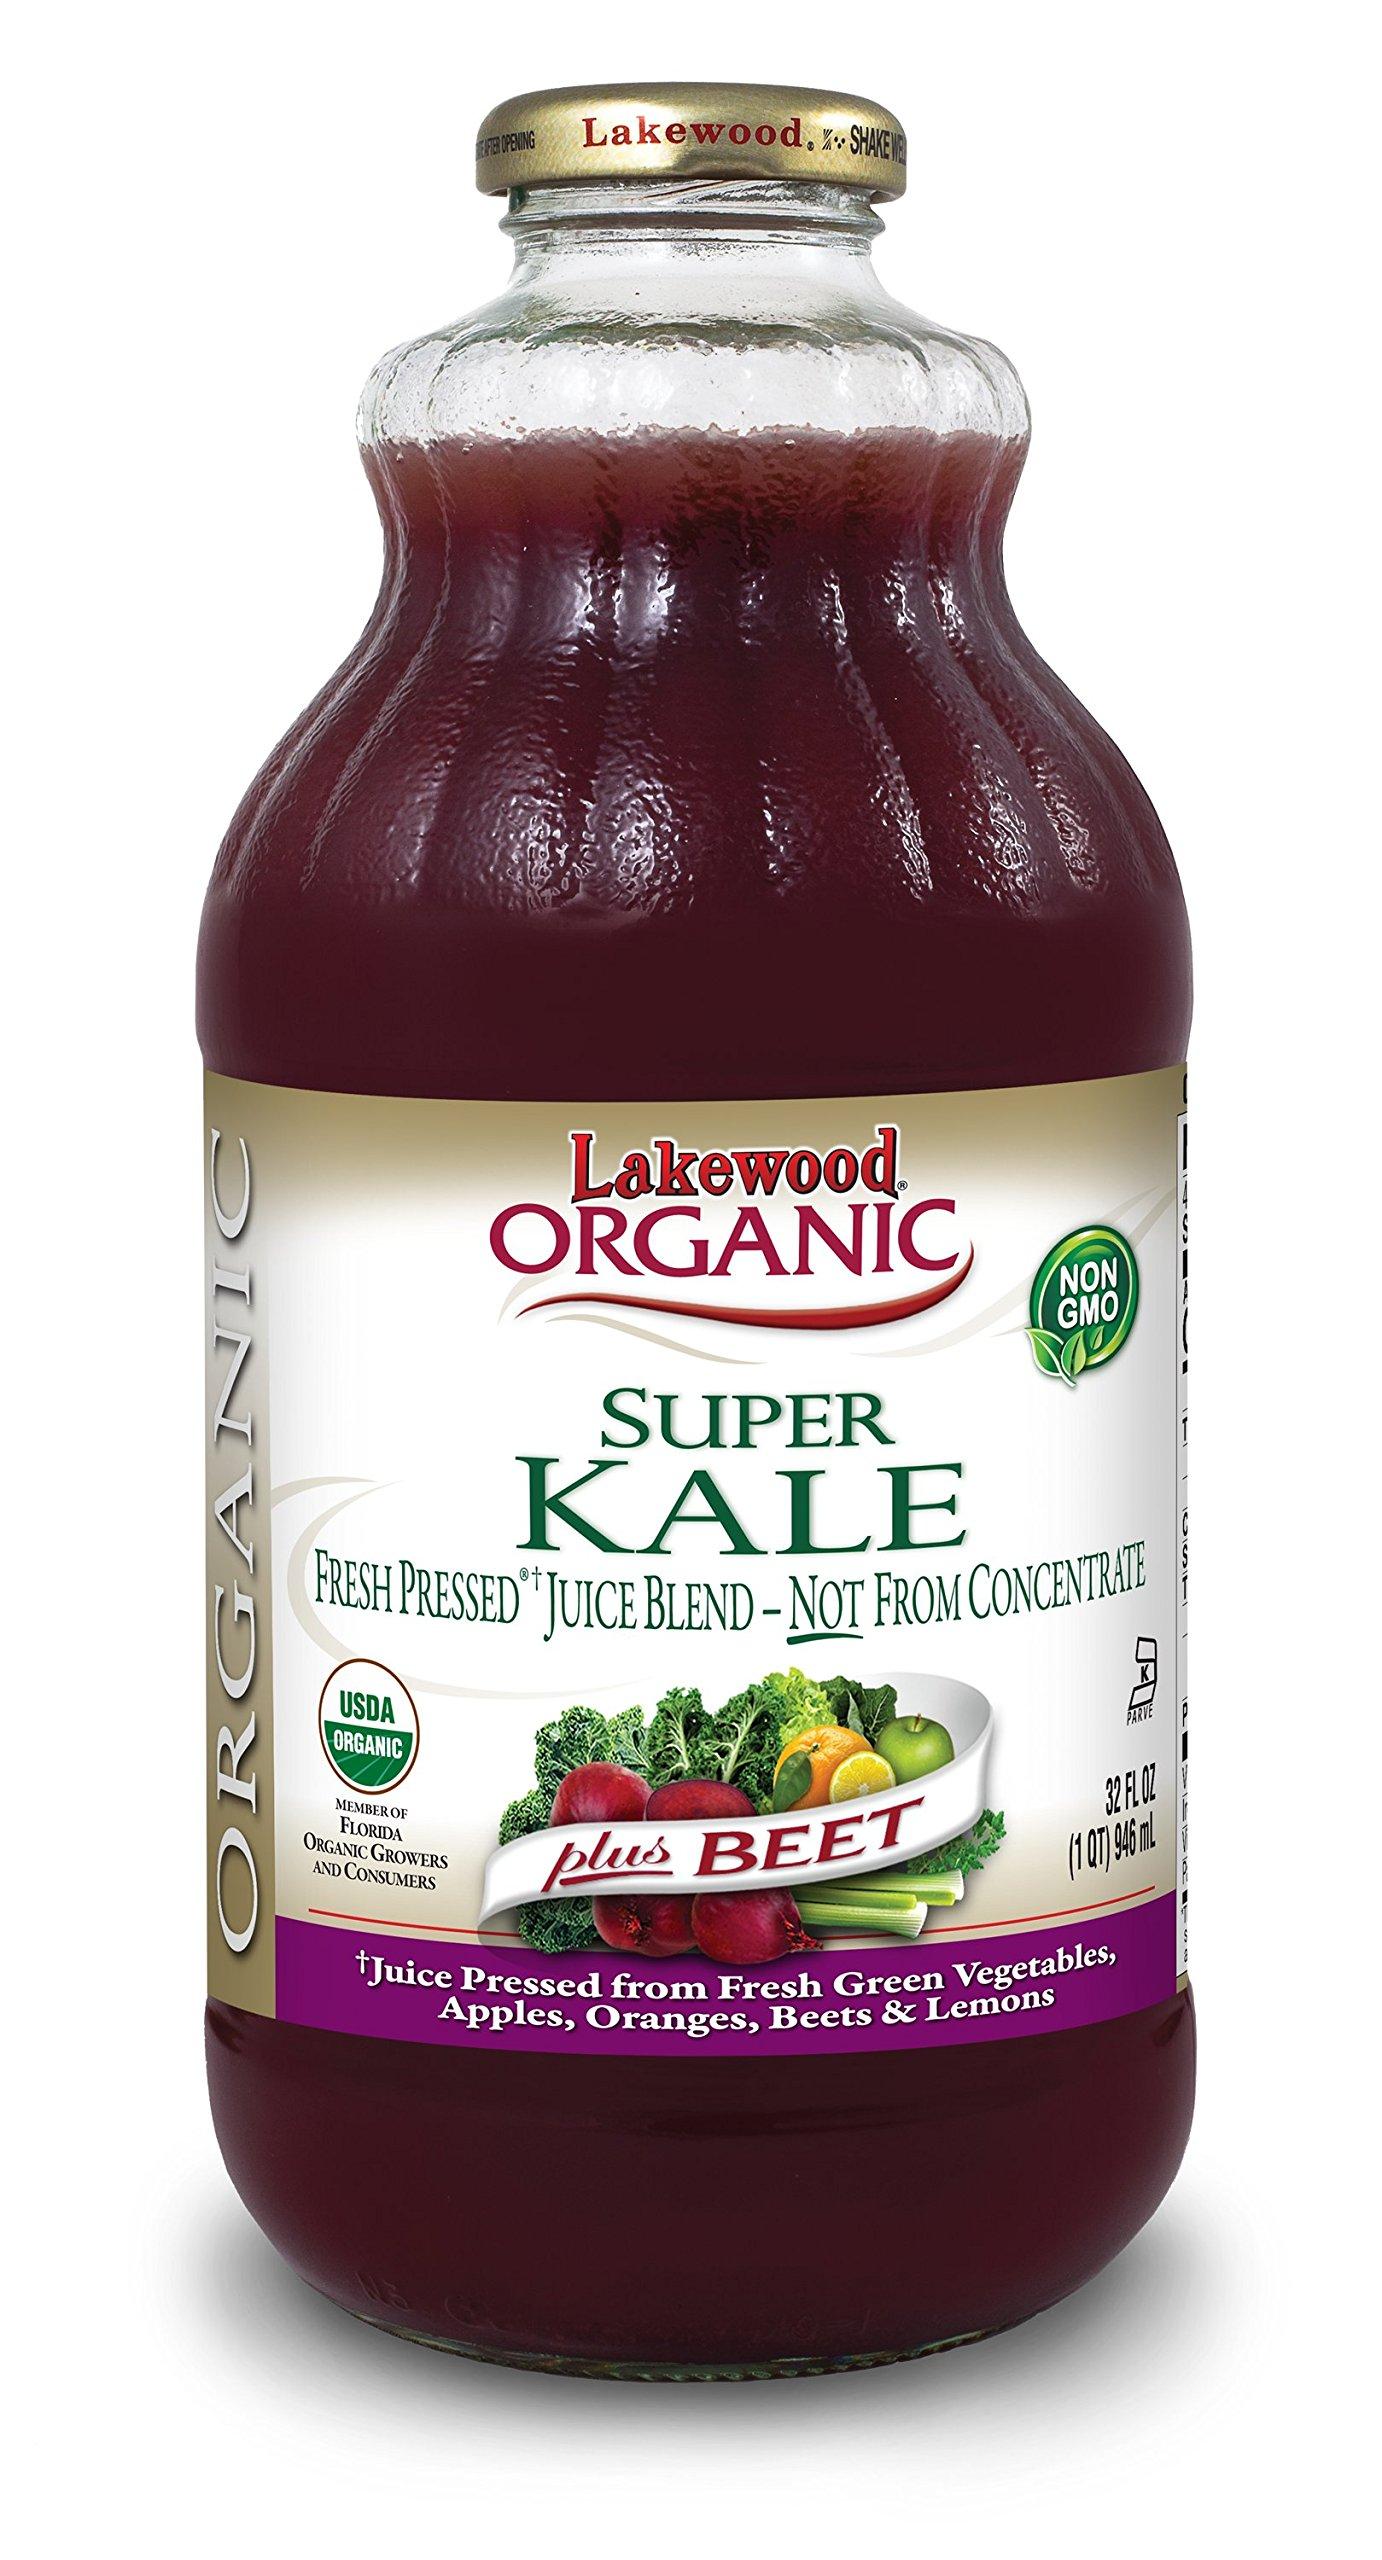 Lakewood Organic Super Kale Plus Beet, 32 Ounce (Pack of 6)